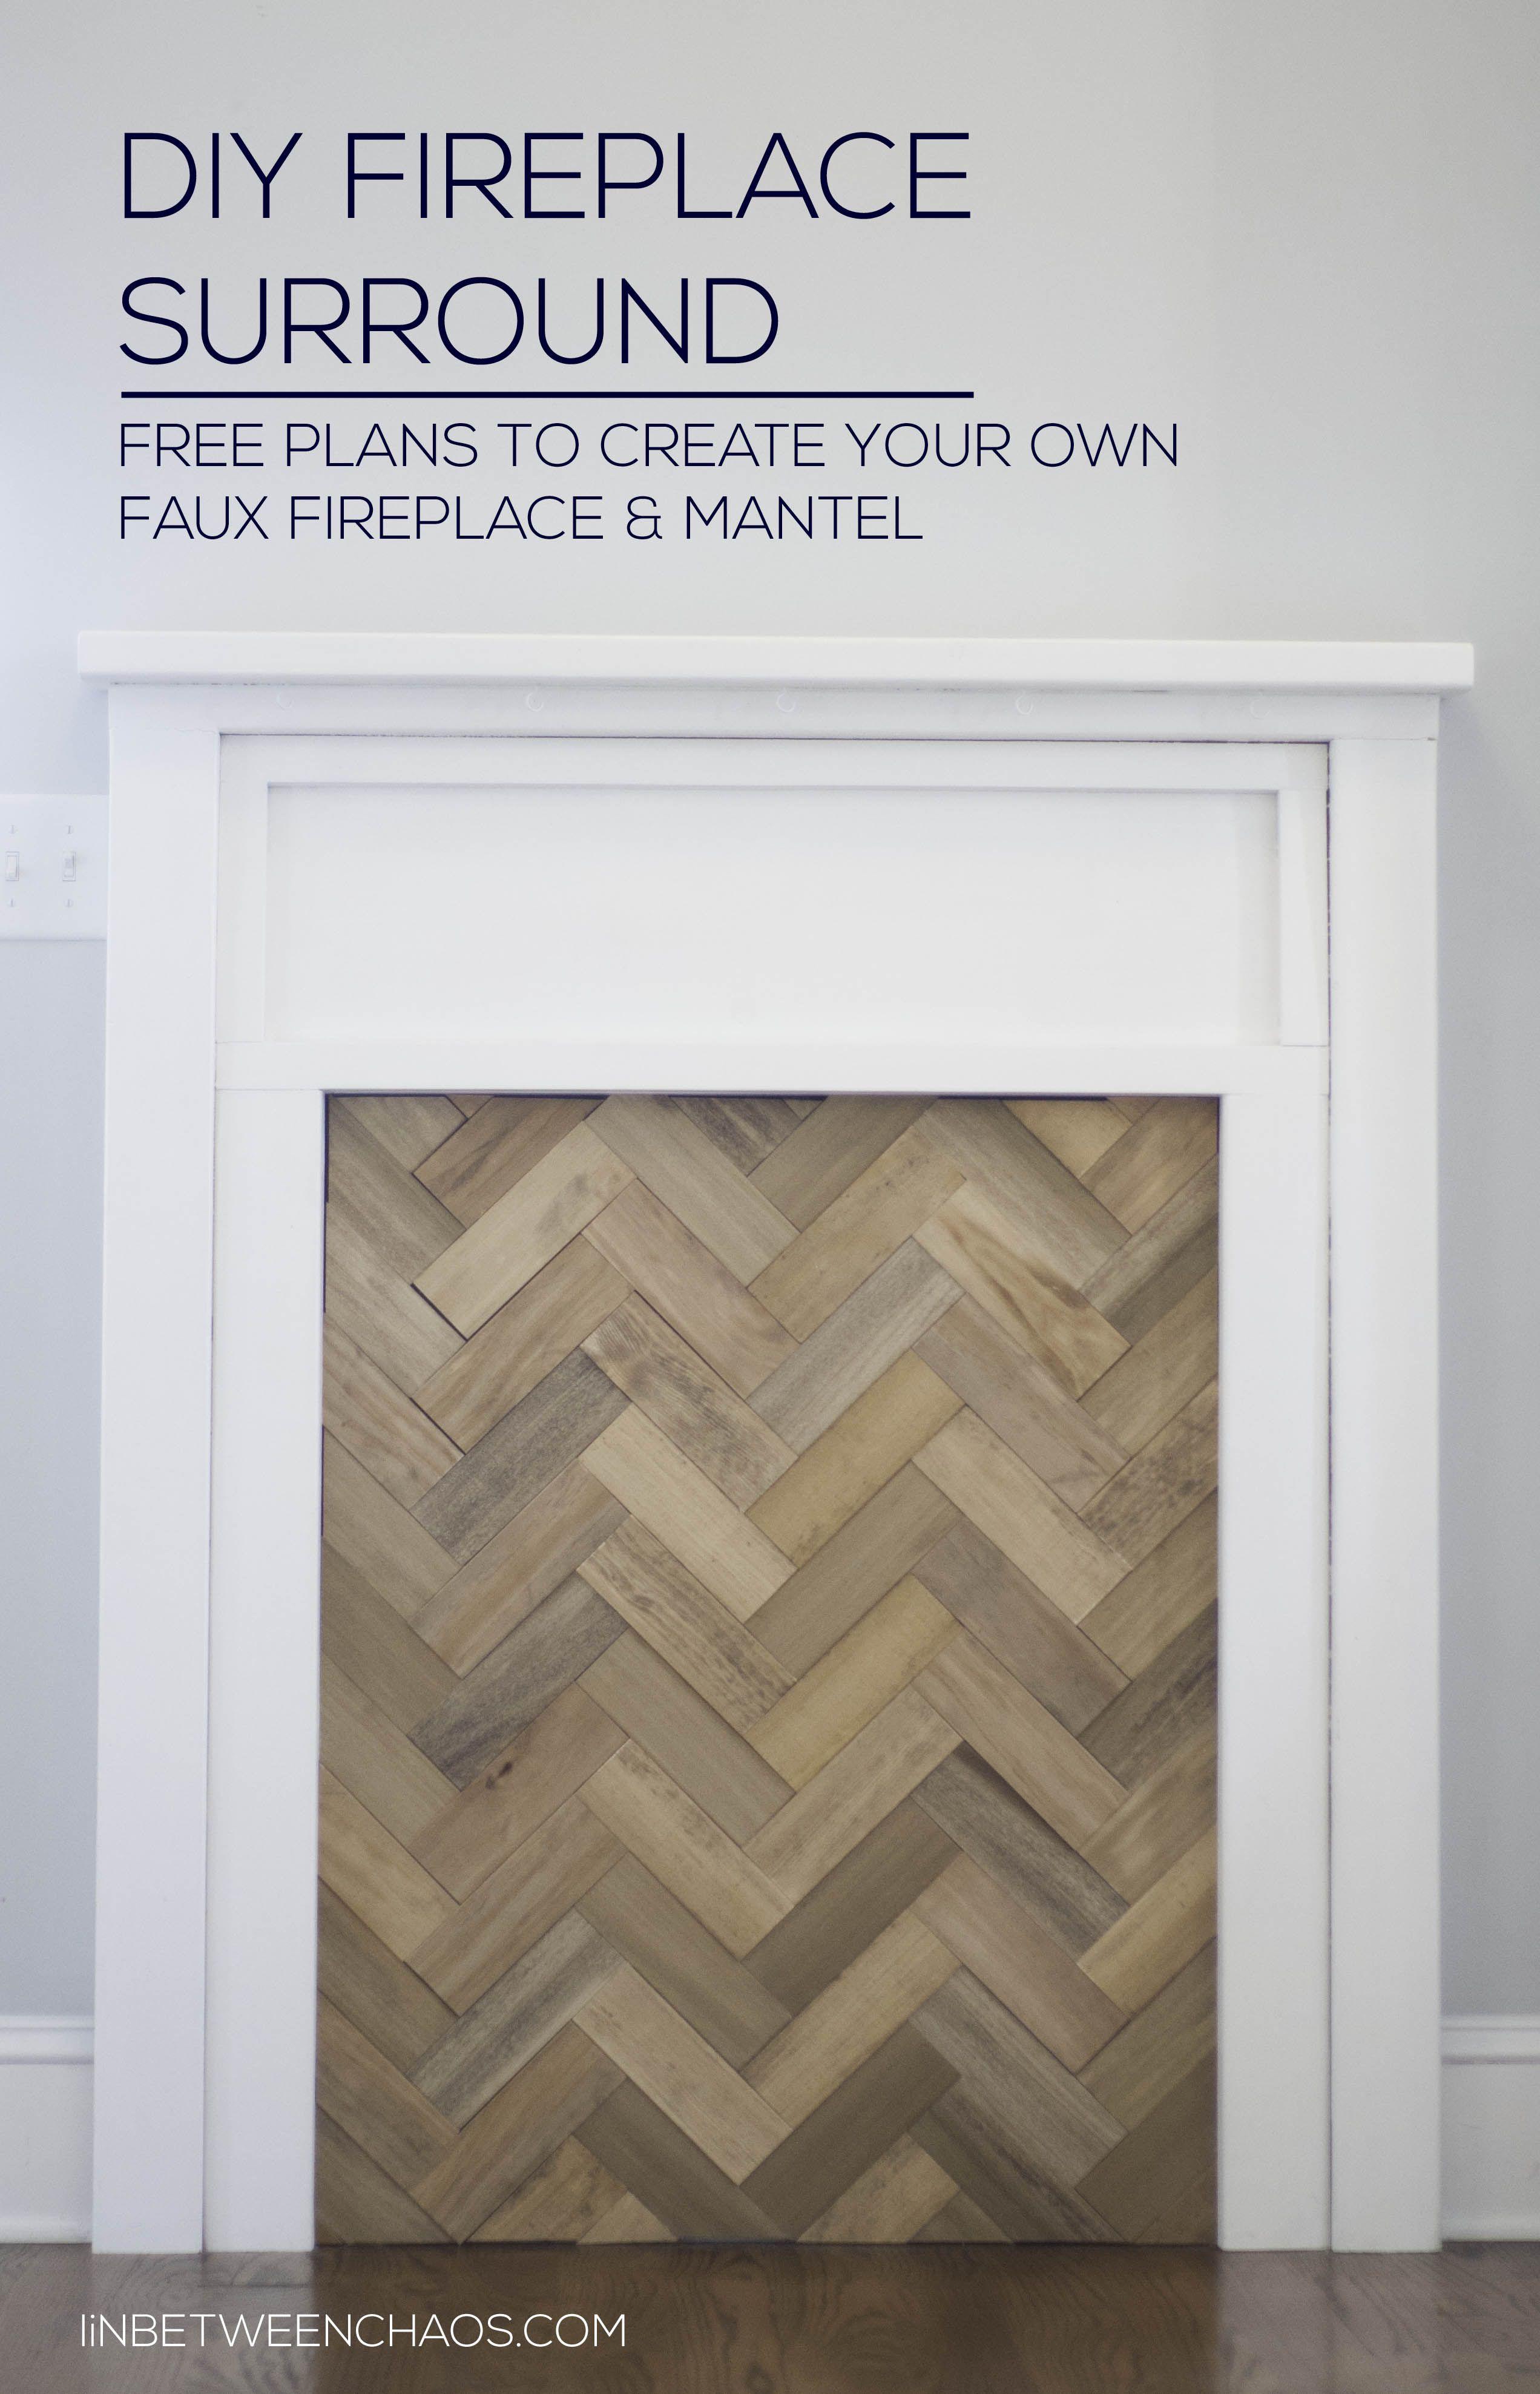 Diy Faux Fireplace With Herringbone Insert - Inbetweenchaoscom